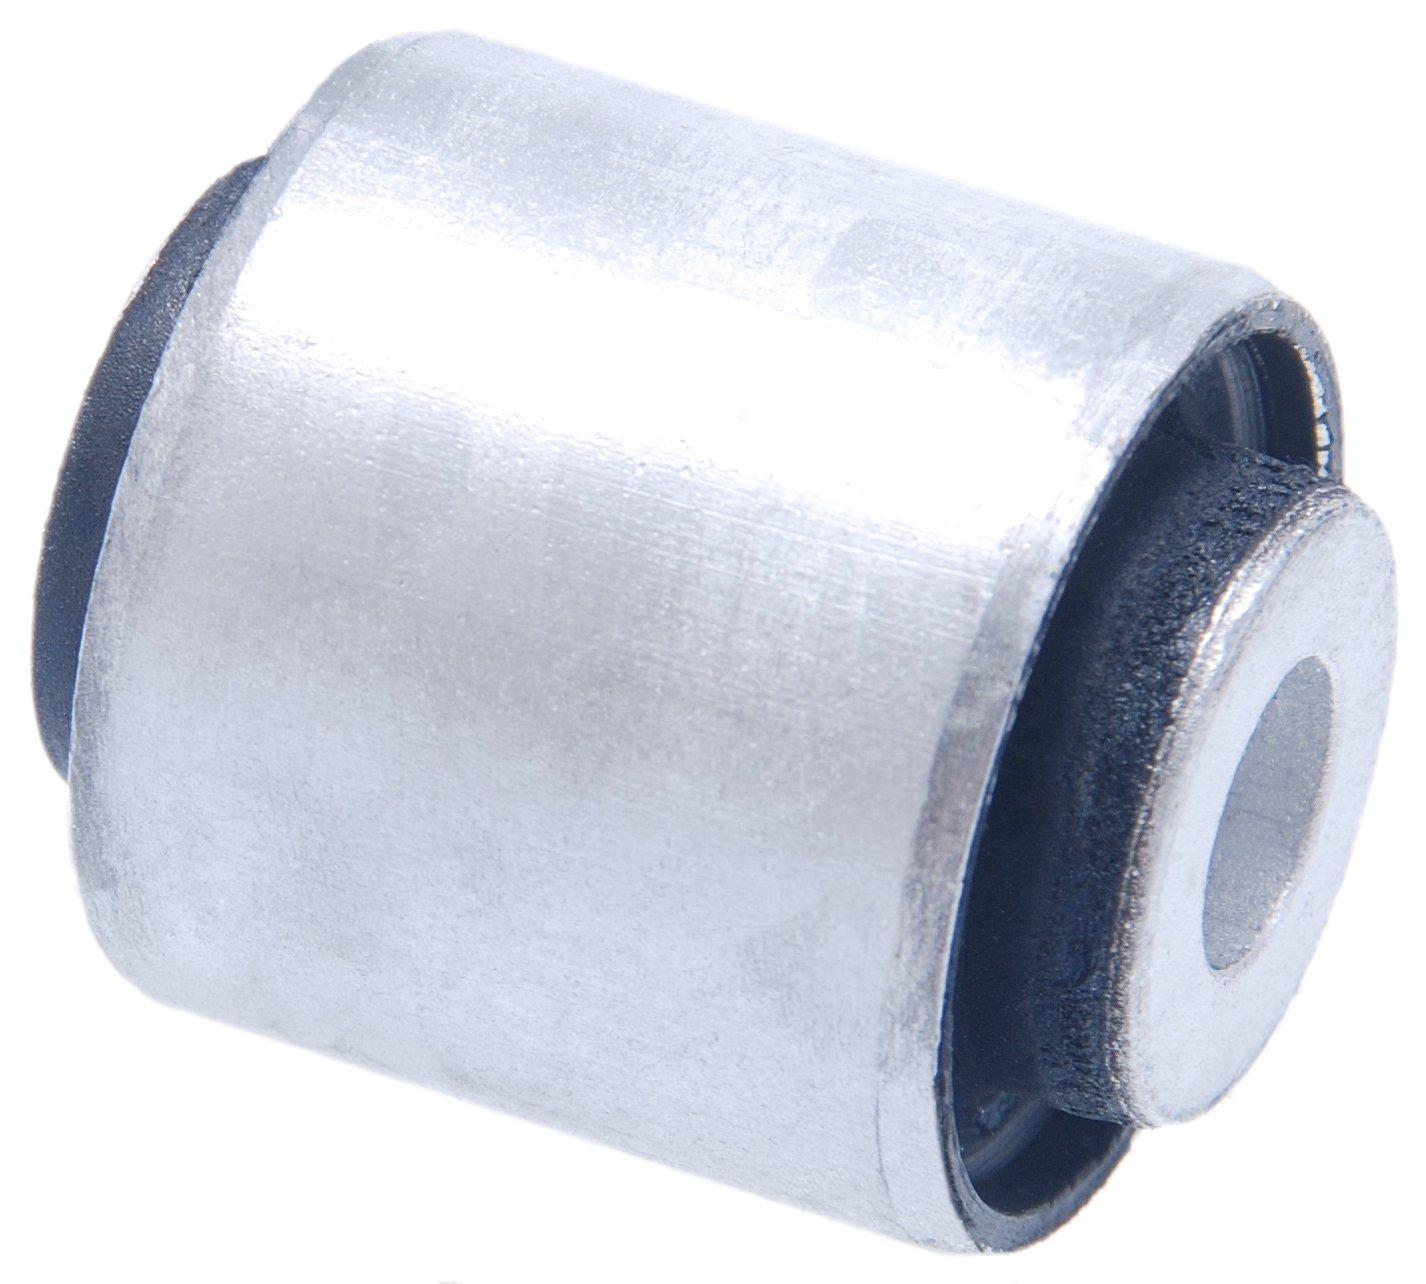 1.25 x 25mm Socket Head 8mm Mr Gasket 978G Steel Metric Header Bolts